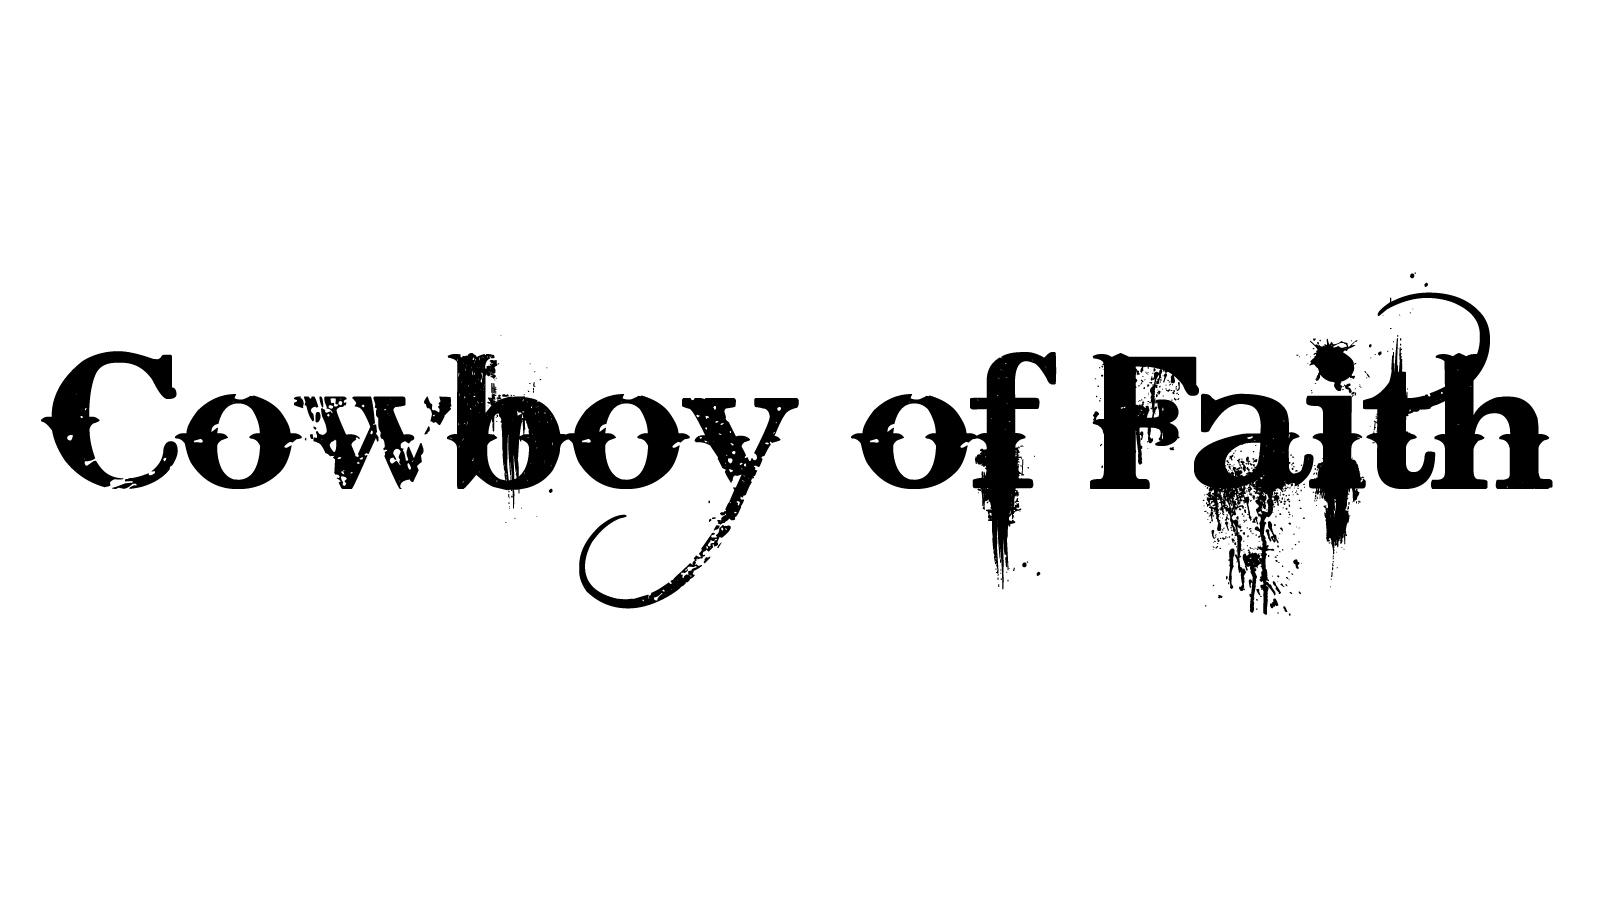 Cowboy For Christcowboy Christtumblr